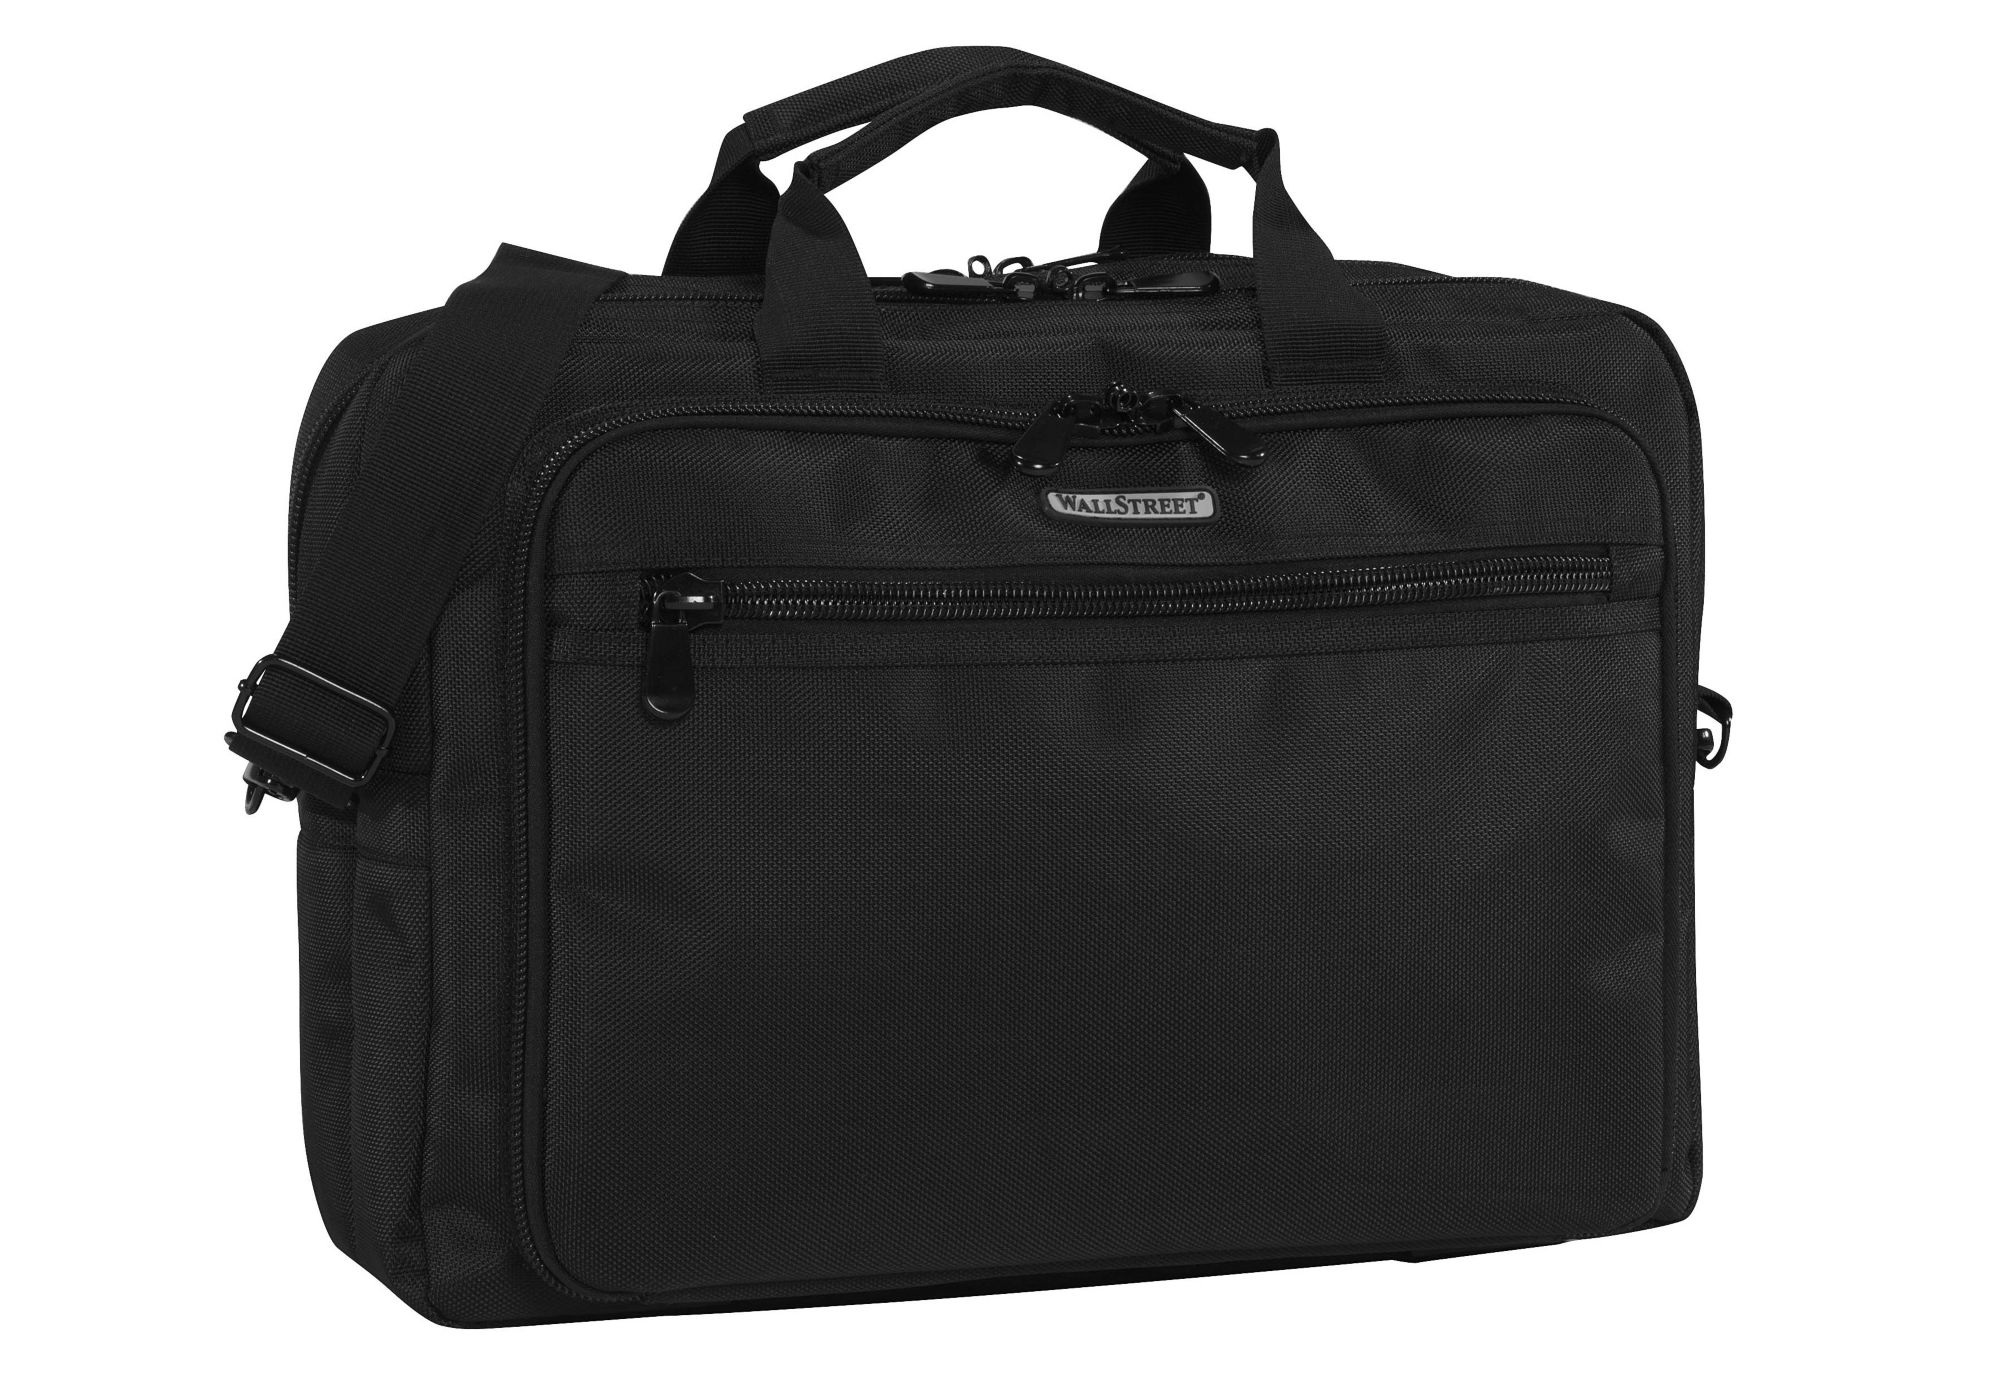 Aktentasche mit Laptopfach bis 15,6-Zoll, »Wallstreet Business Bag«